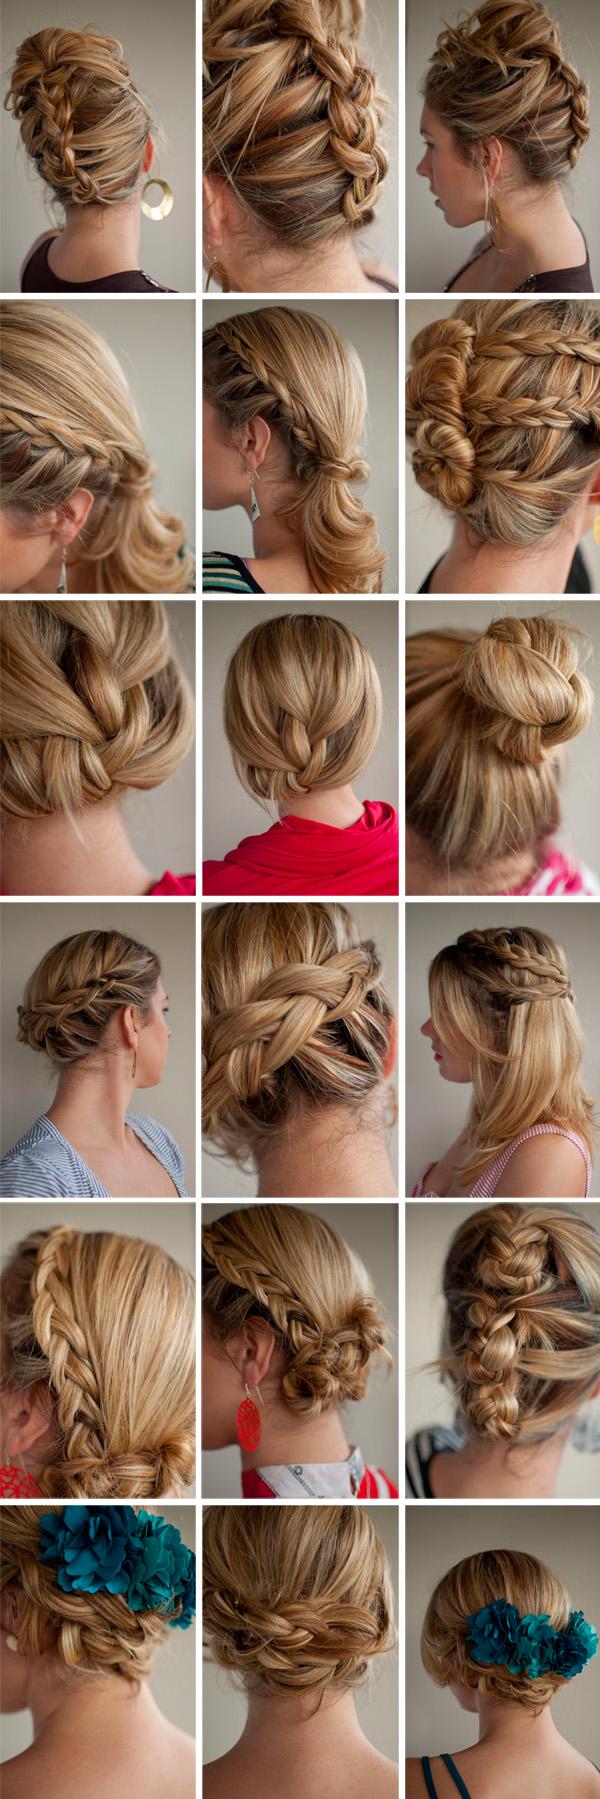 new hair romance hairstyle challenge - 30 braids in 30 days